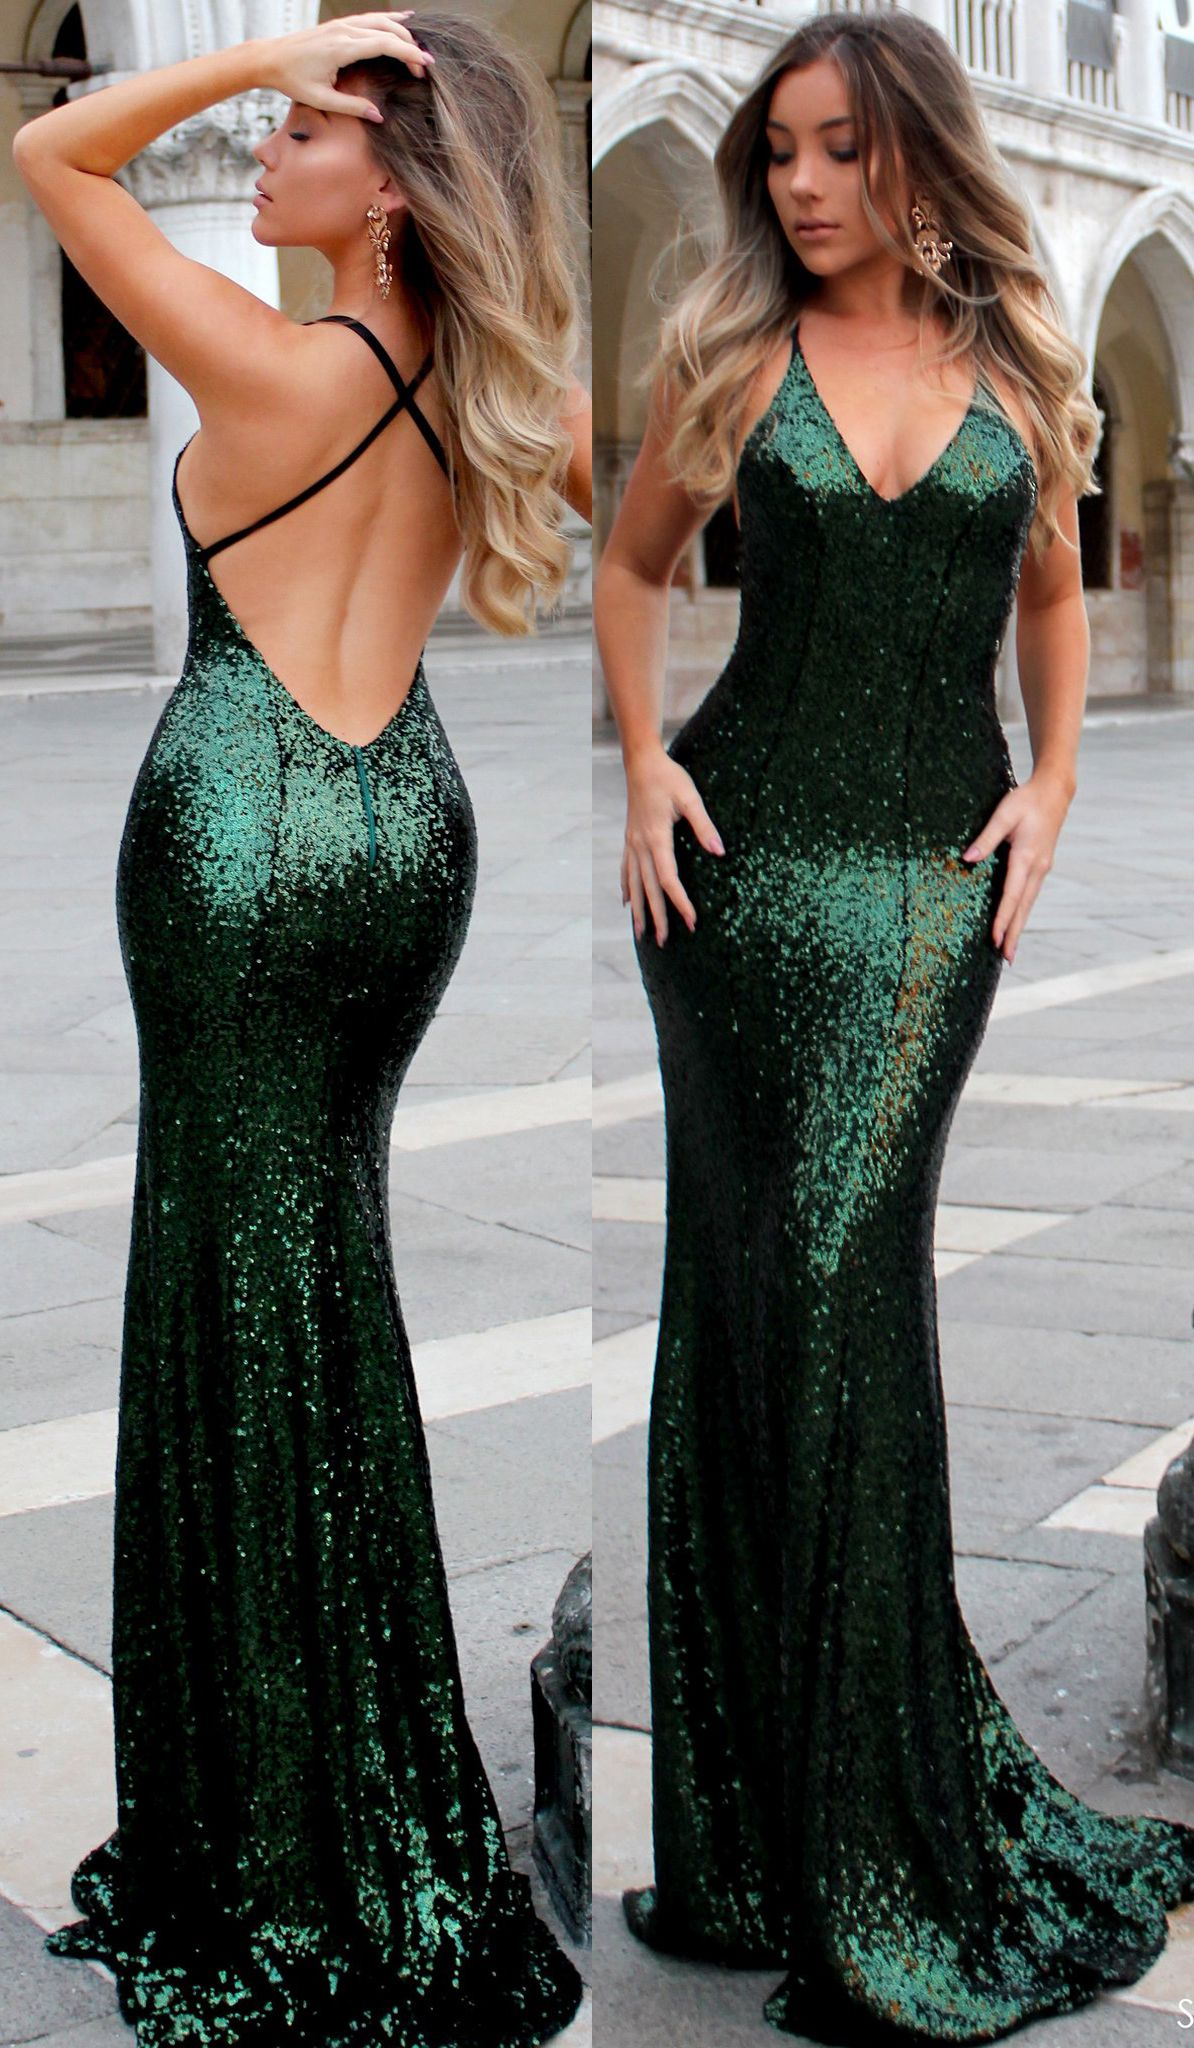 Mermaid v neck sequin long prom dress dark green formal evening gown